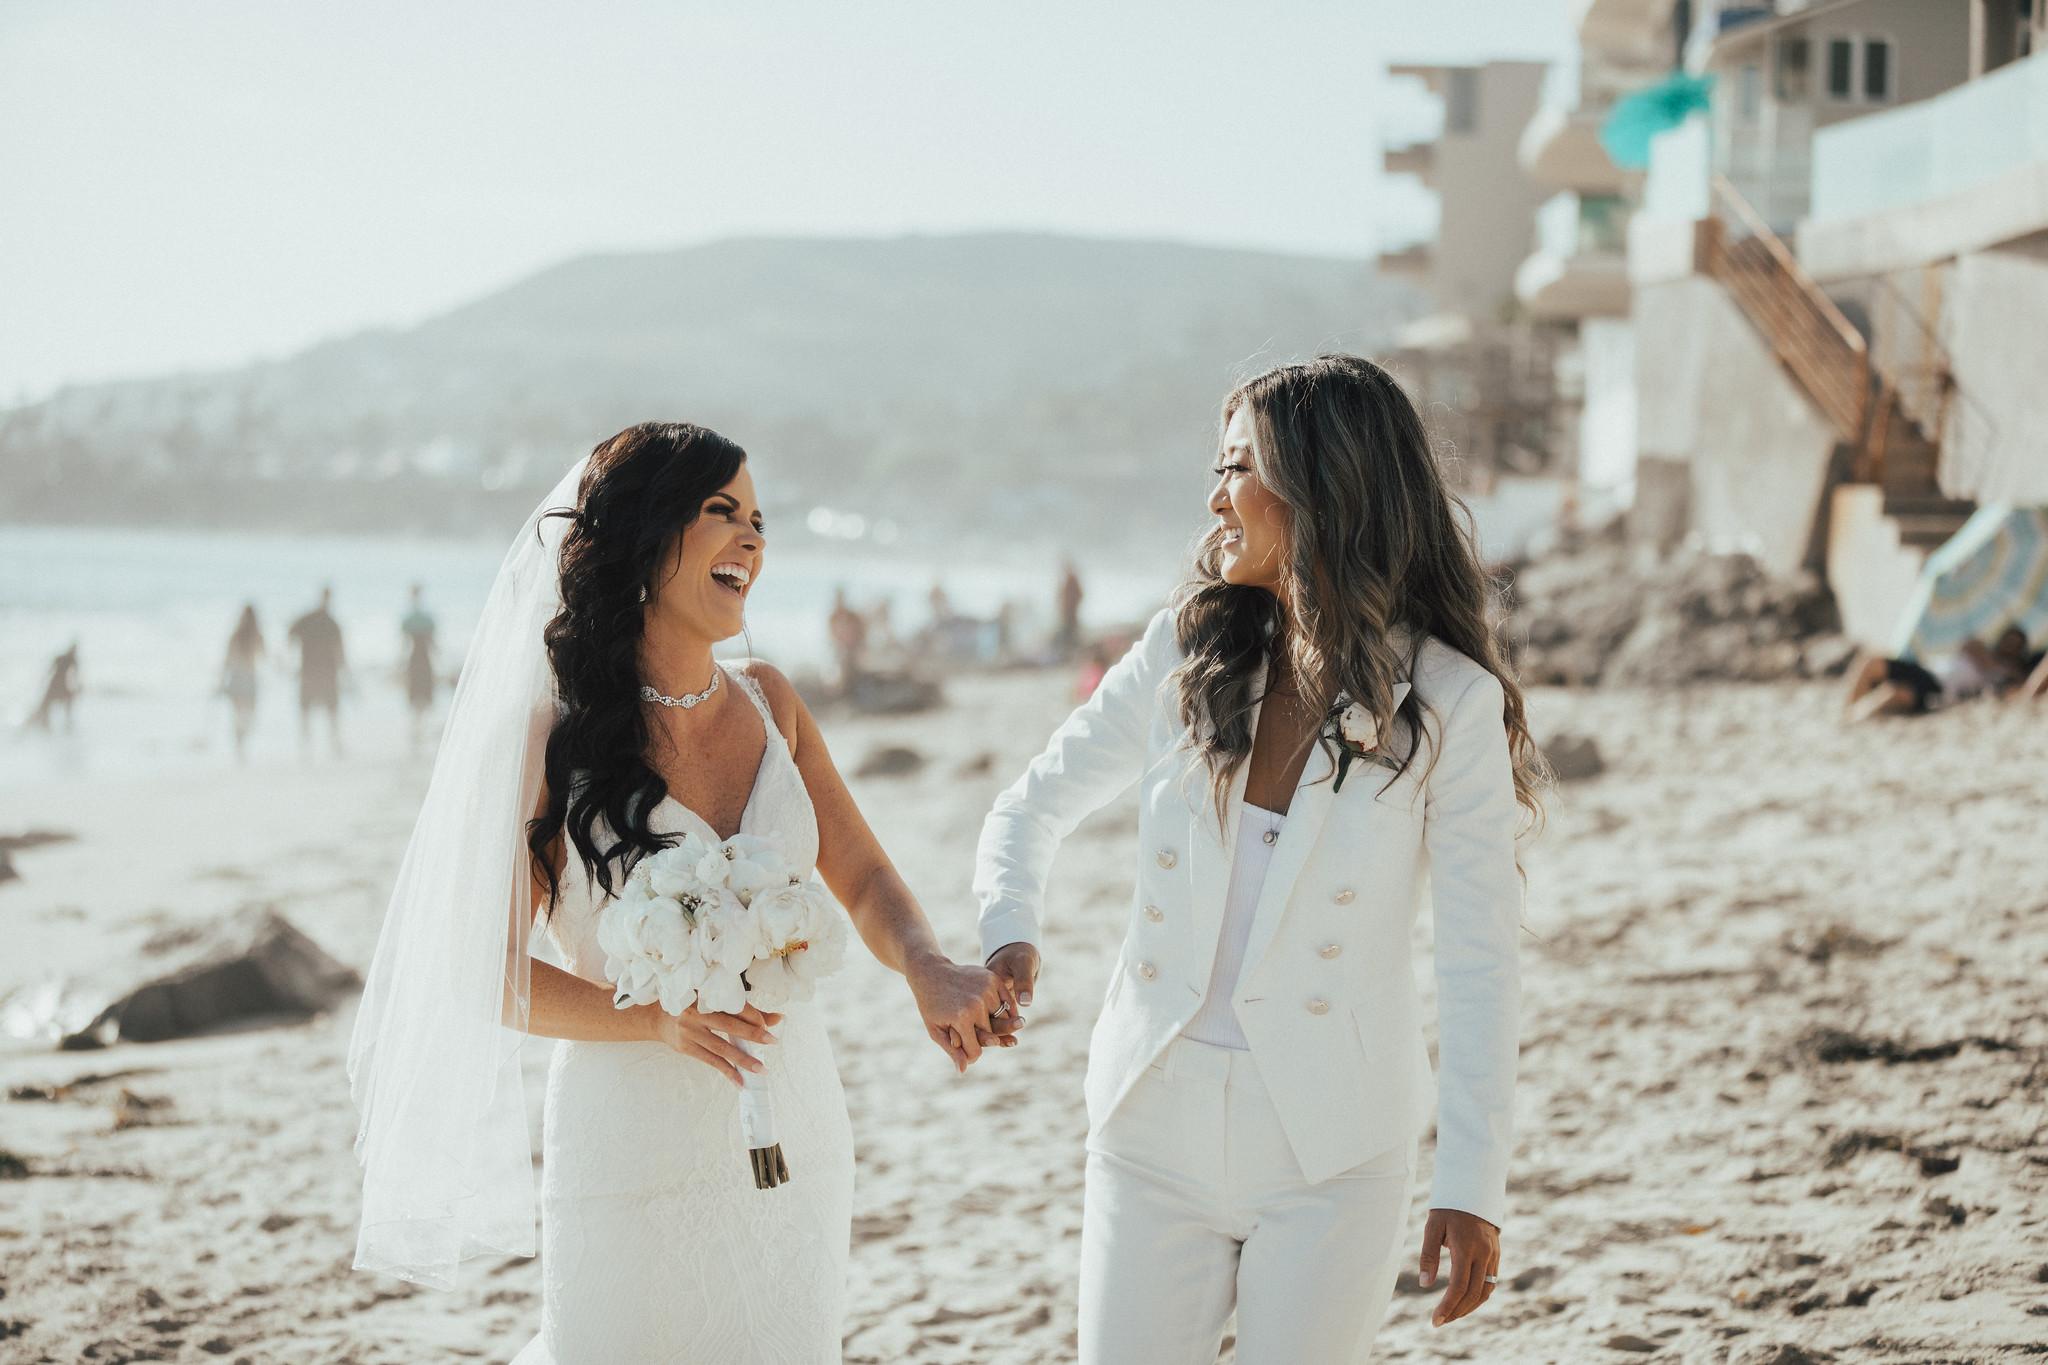 lesbian couple, lesbian wedding, two brides, same sex wedding, beach